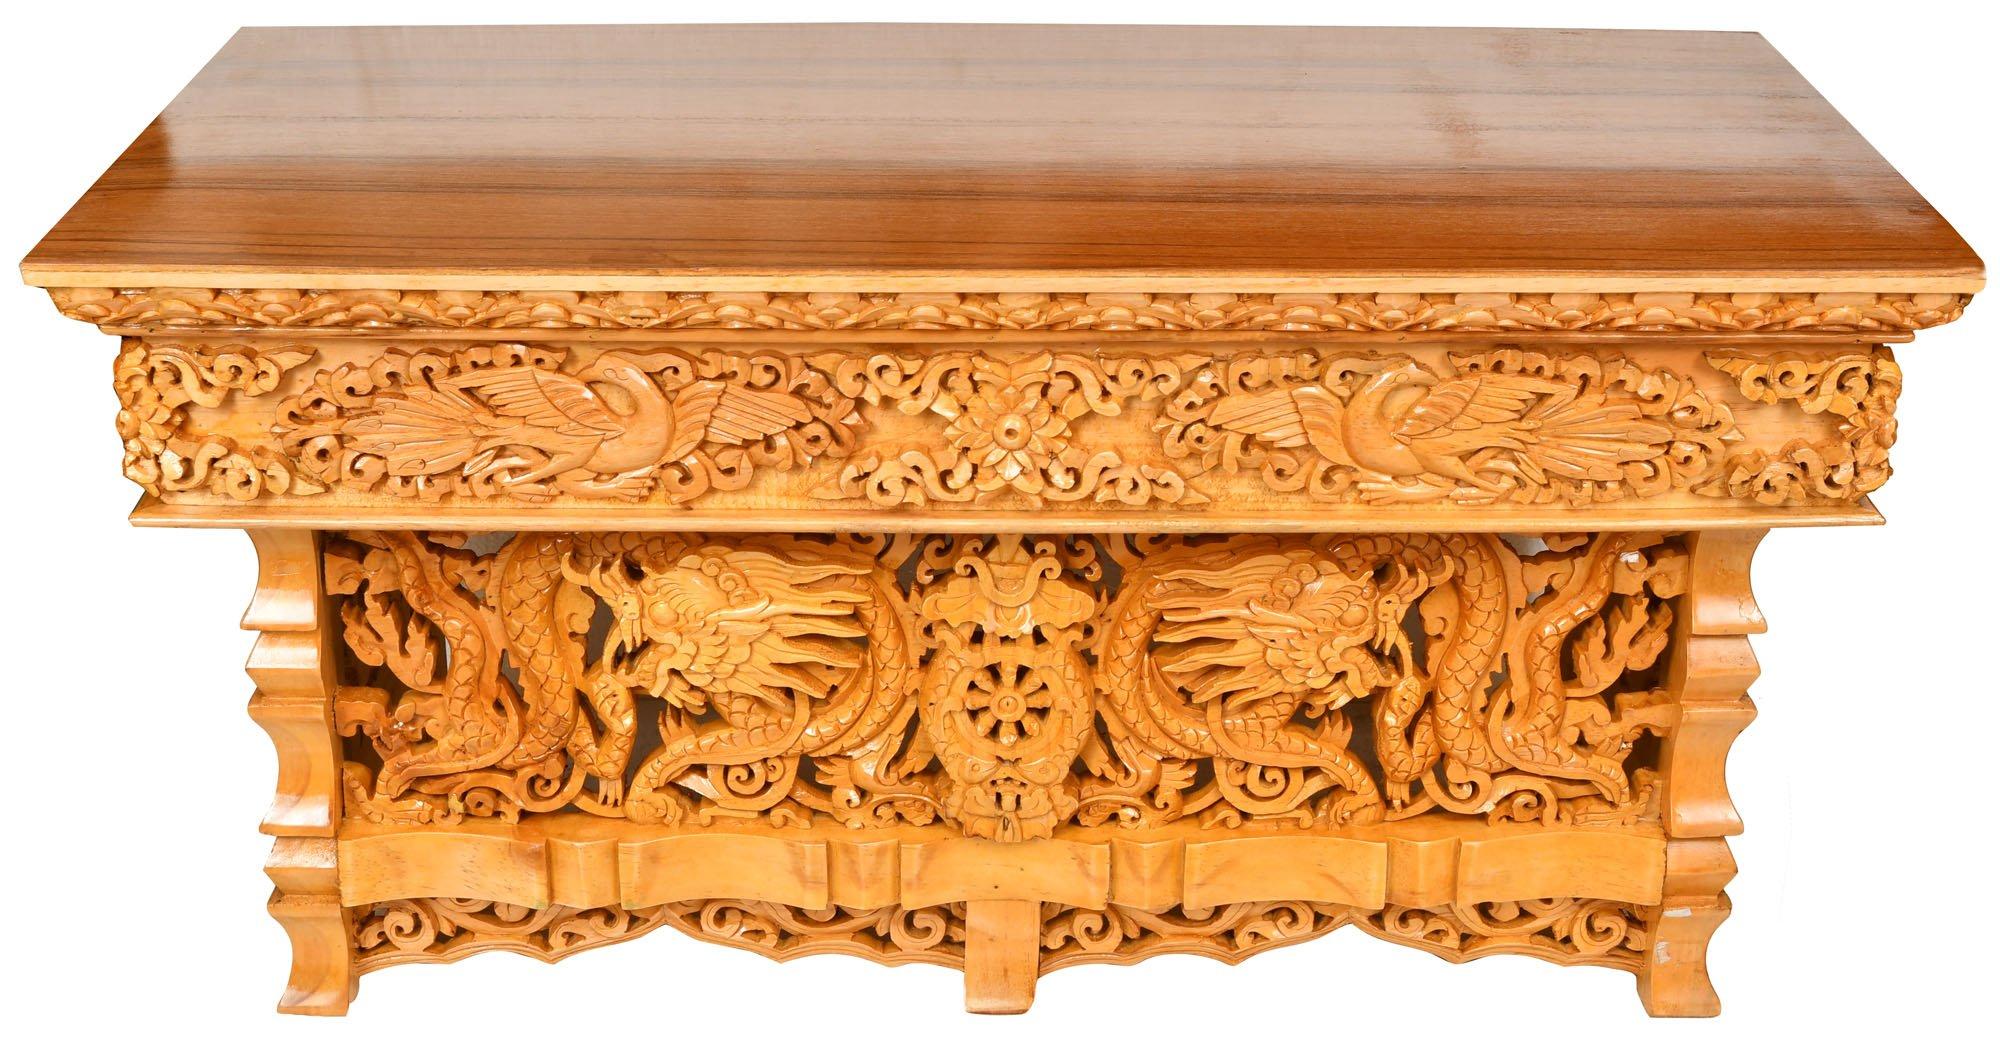 Incroyable Sculptures U003e Wood U003e Buddhist U003e Buddhist Altar Table